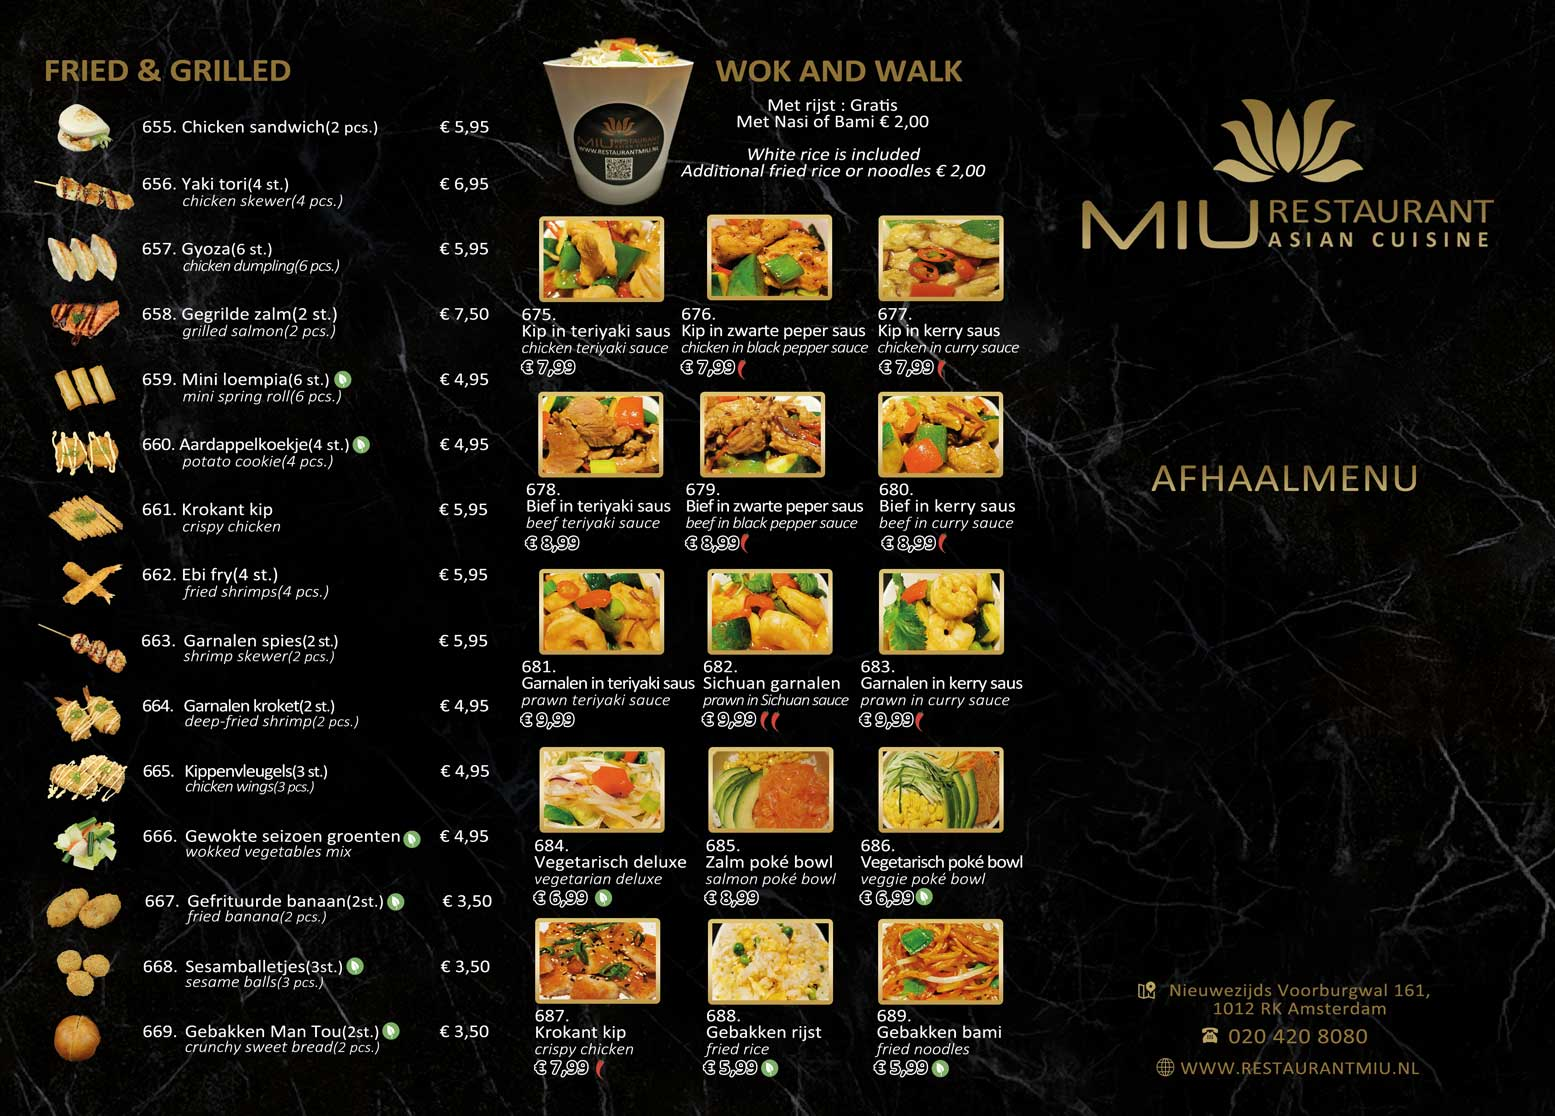 restaurant-miu-asian-cuisine-Afhaalmenukaart-vk